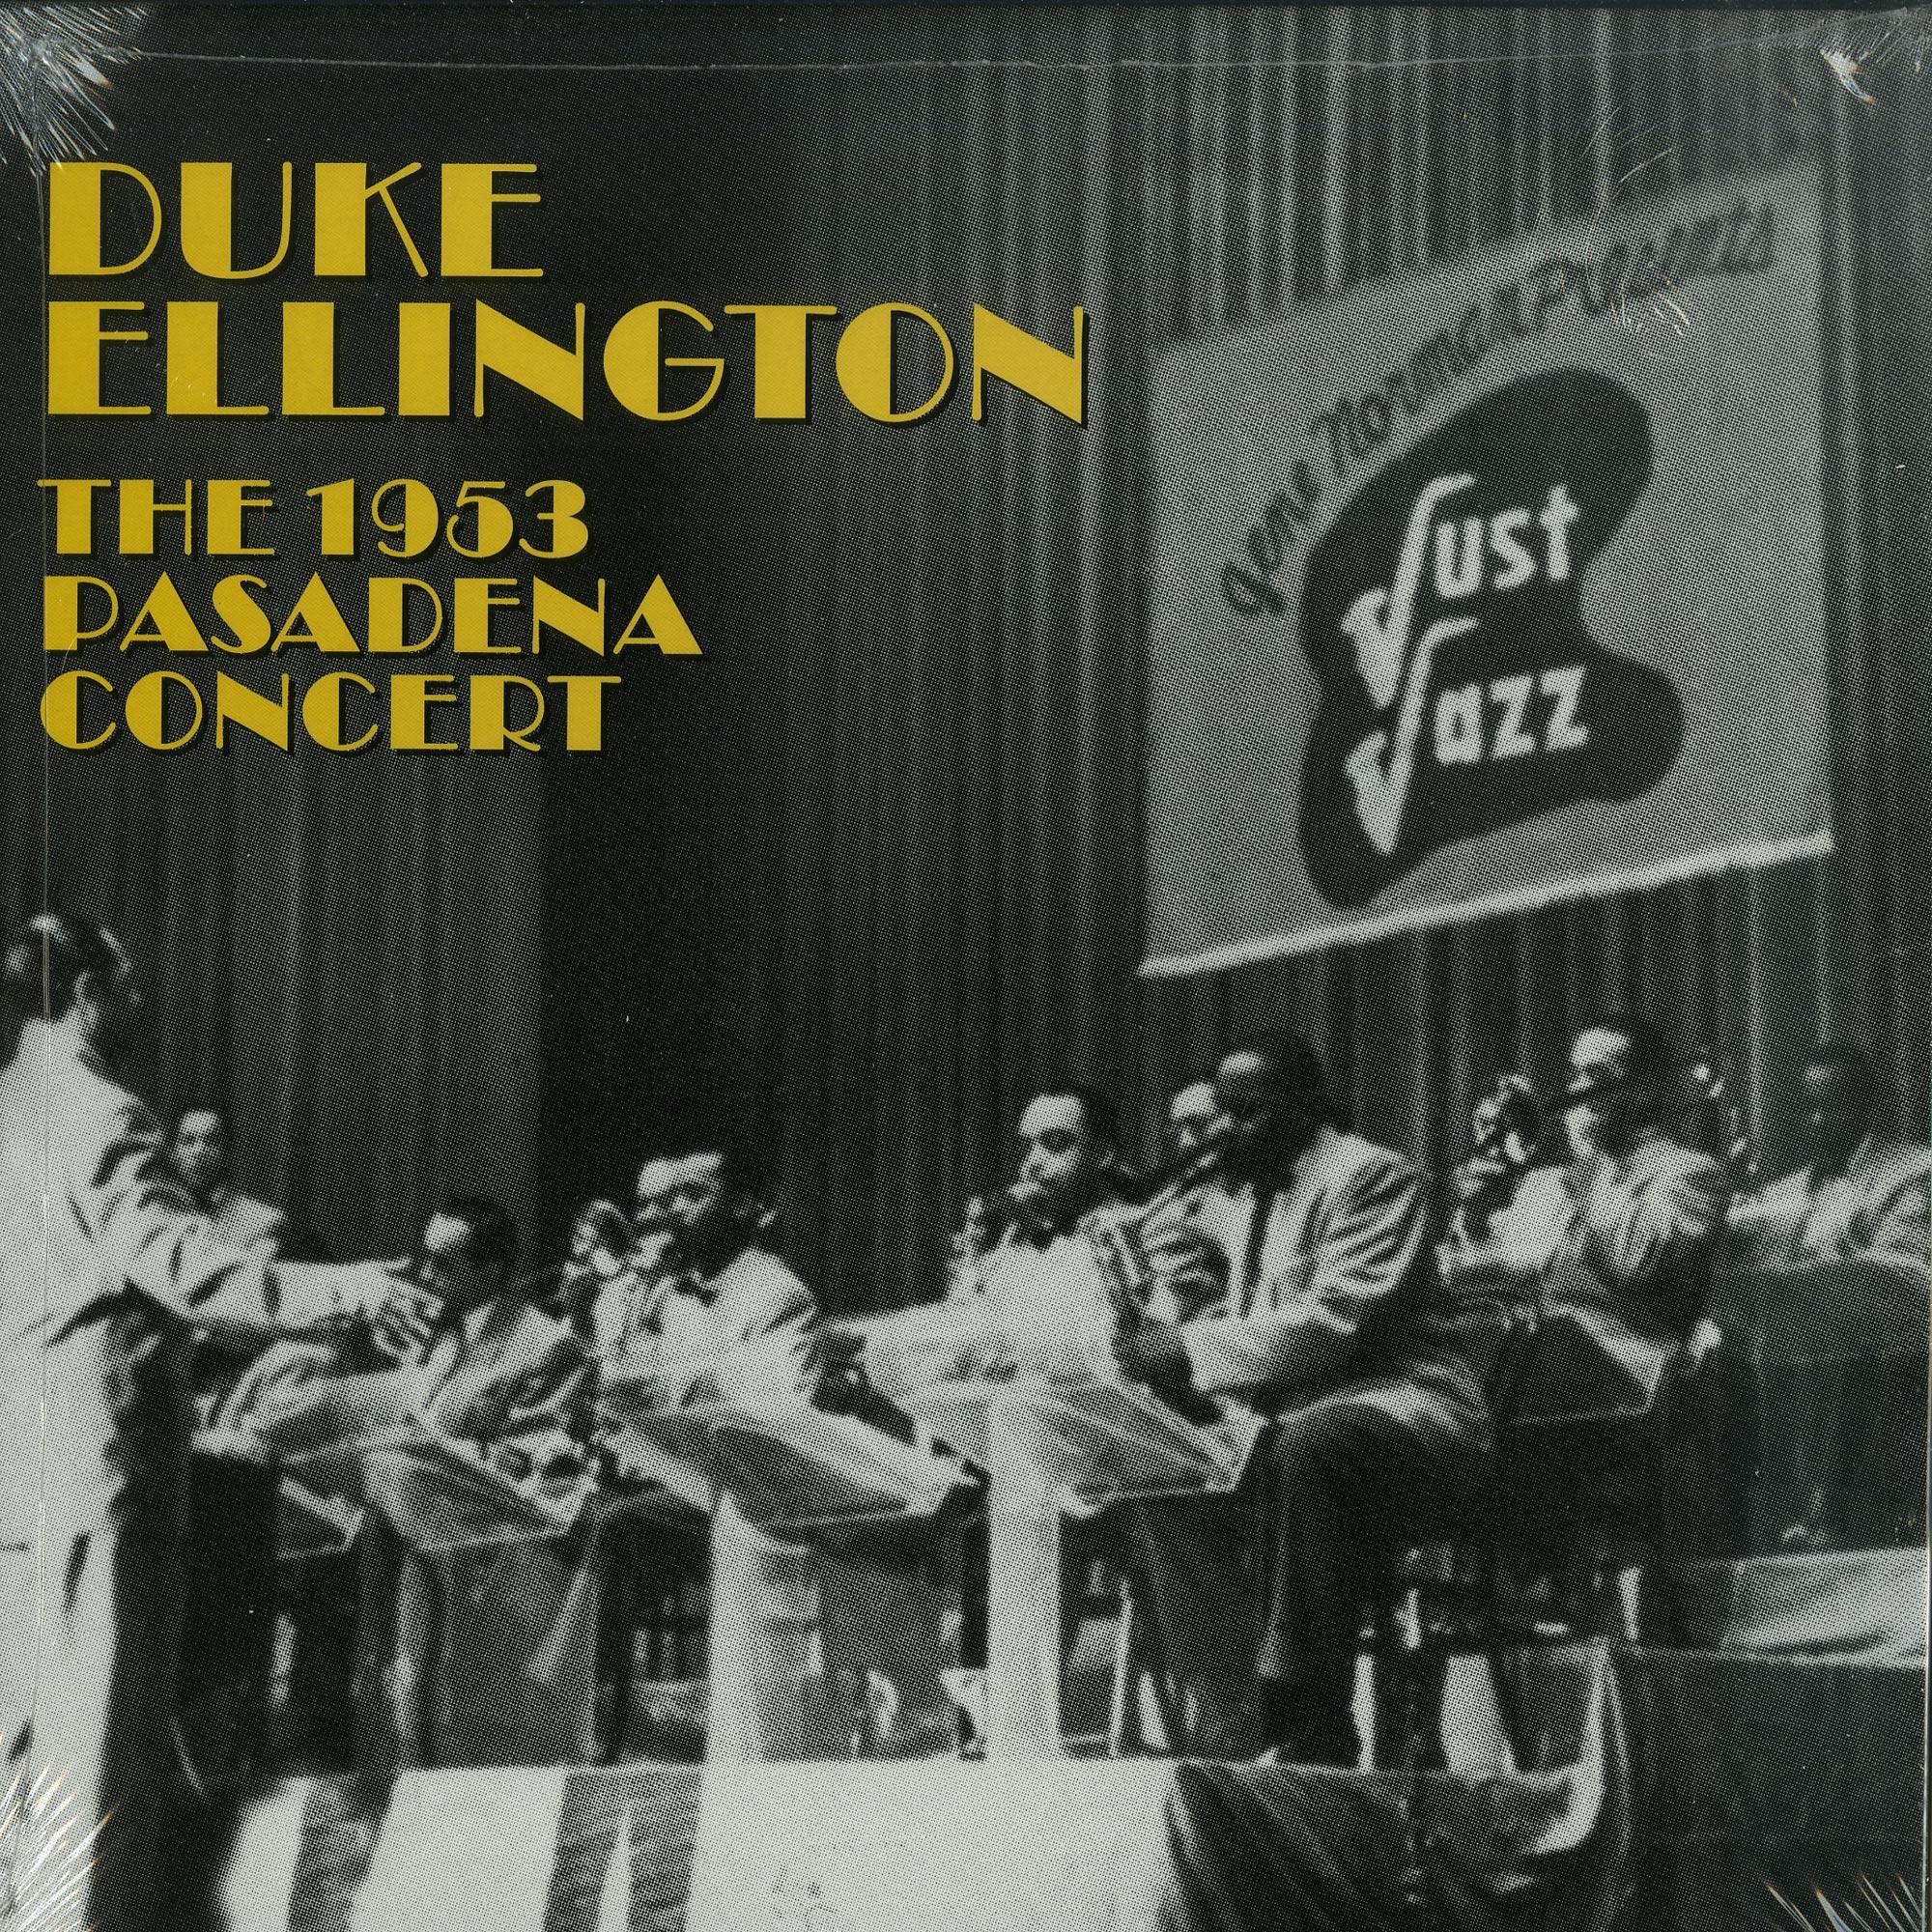 Duke Ellington - THE 1953 PASADENA CONCERT